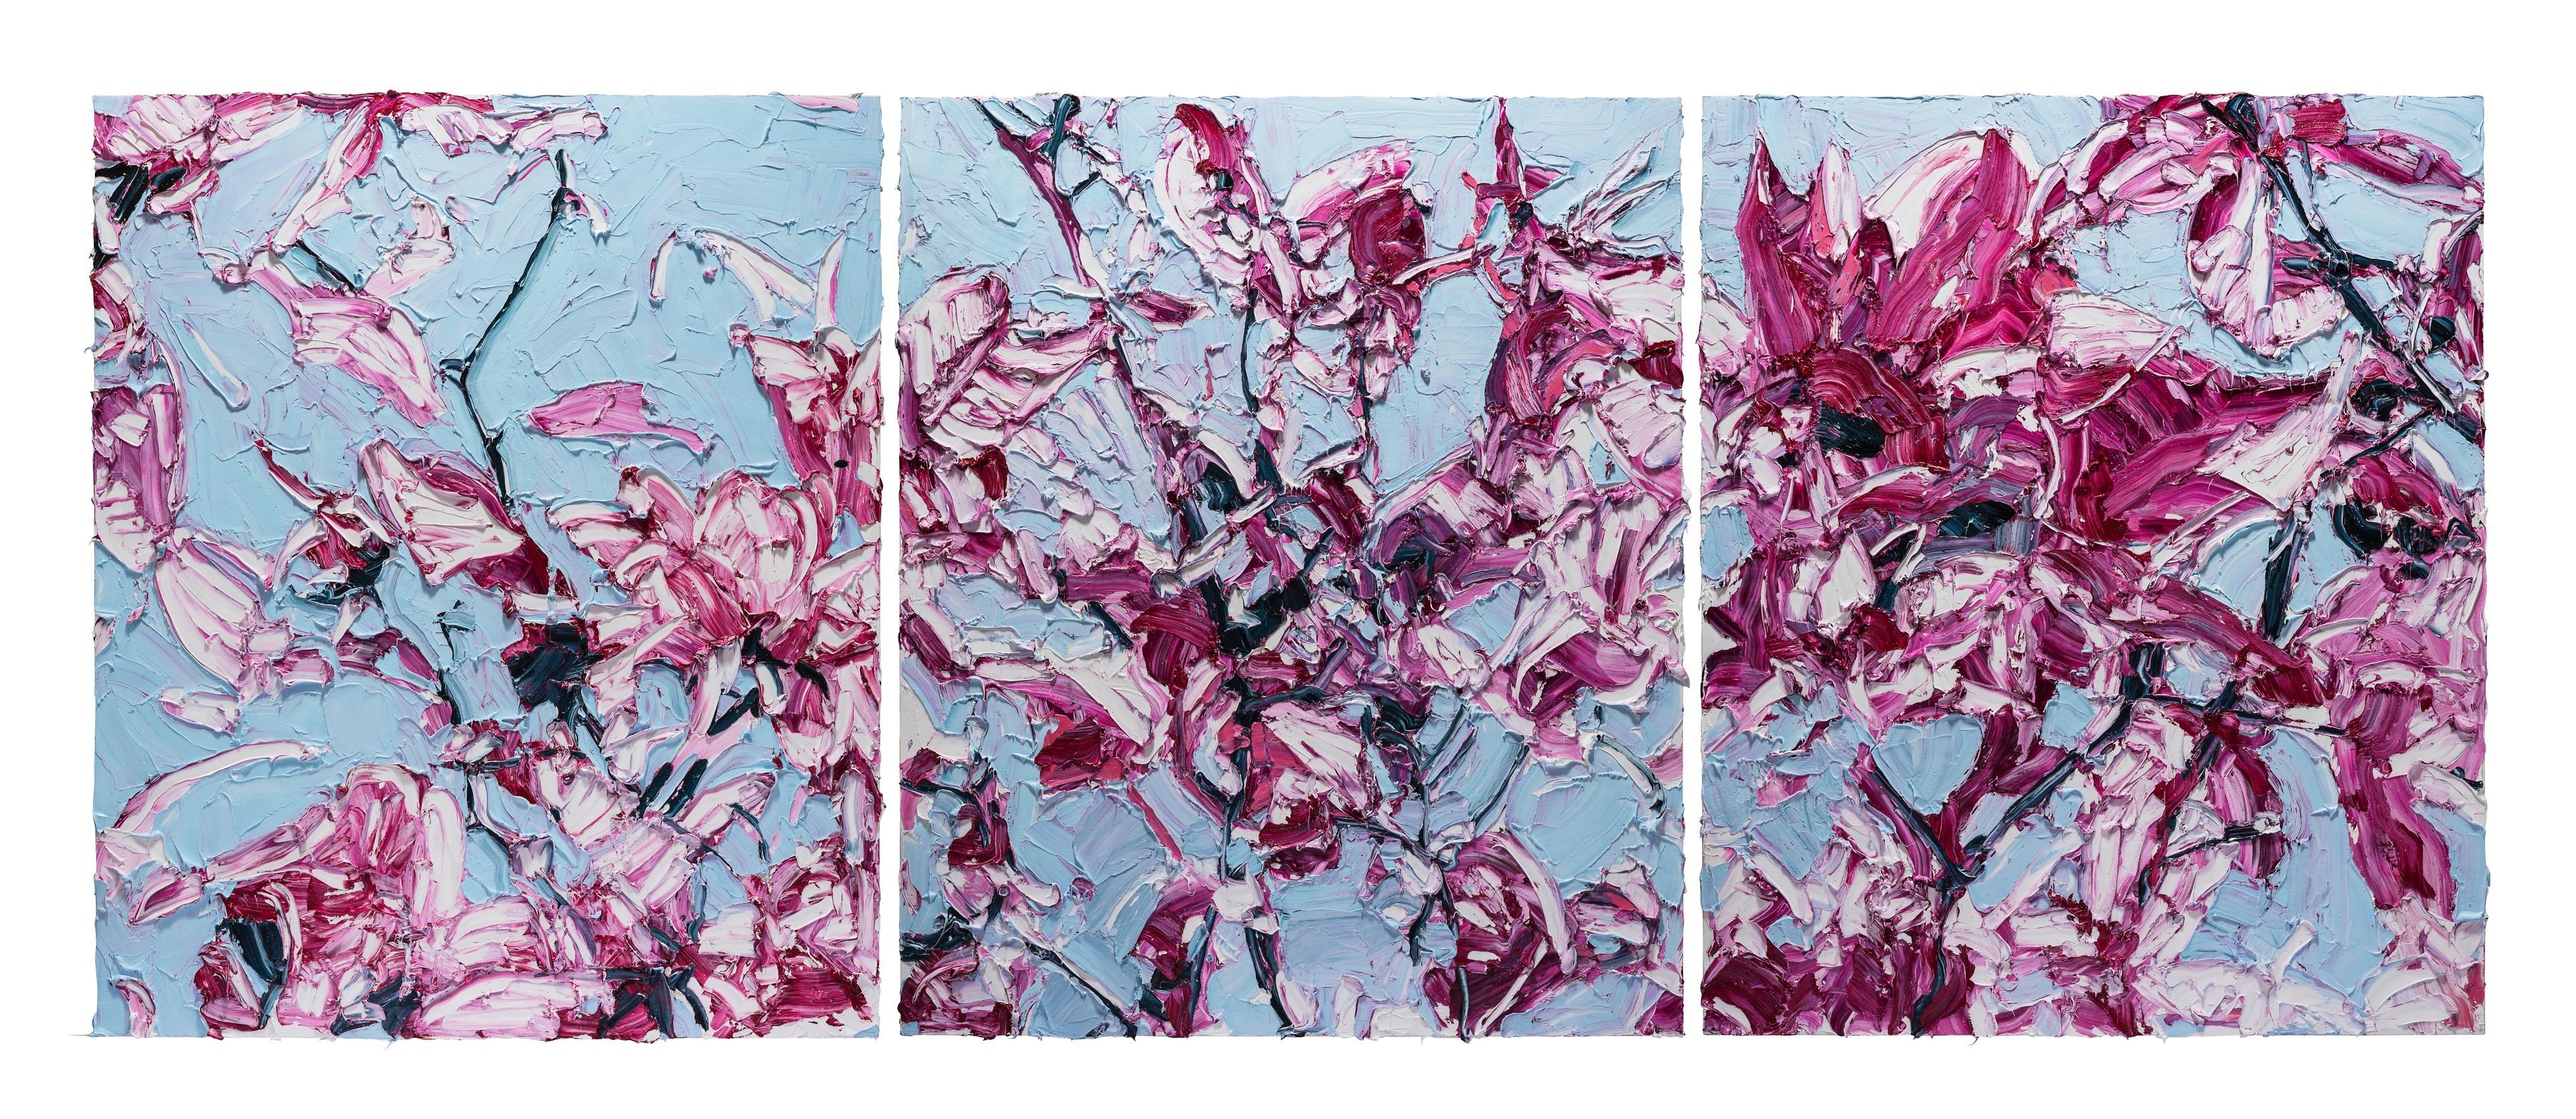 Linen Magnolia 4.5x1.8cm Triptych Oil on Linen Mounted onto DiaBond